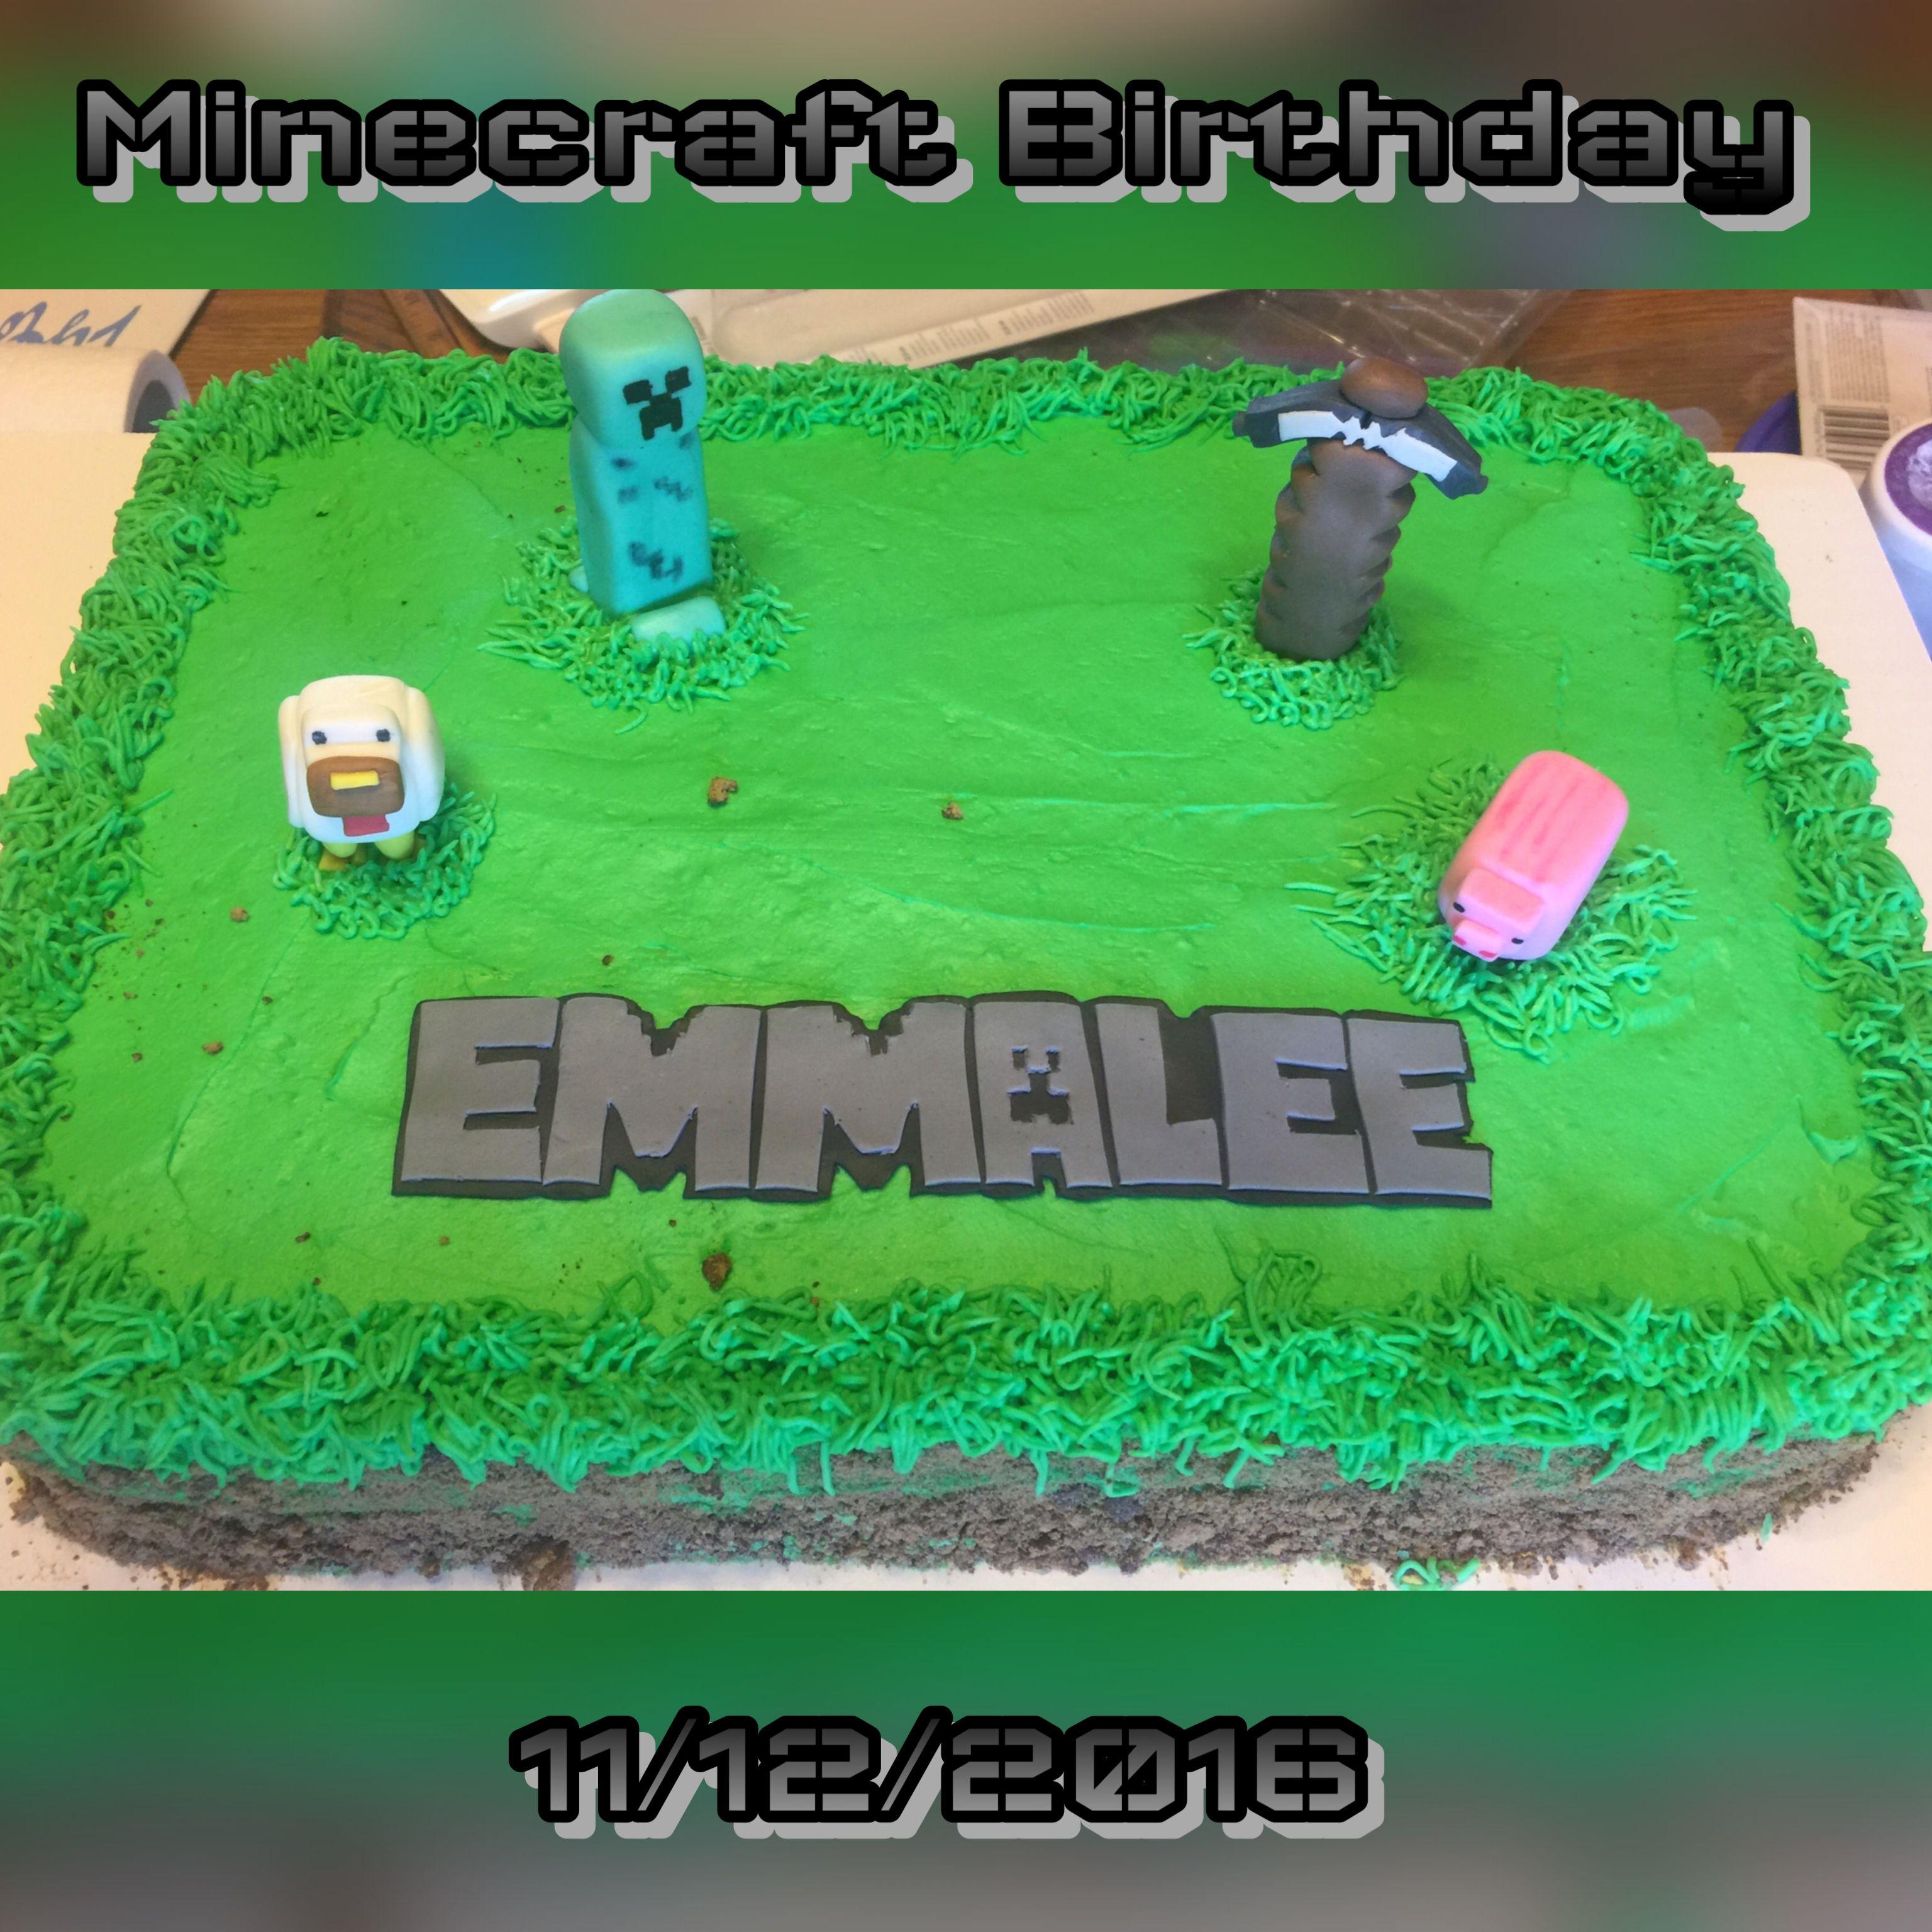 Minecraft Birthday. Vanilla cake decorated with frosting